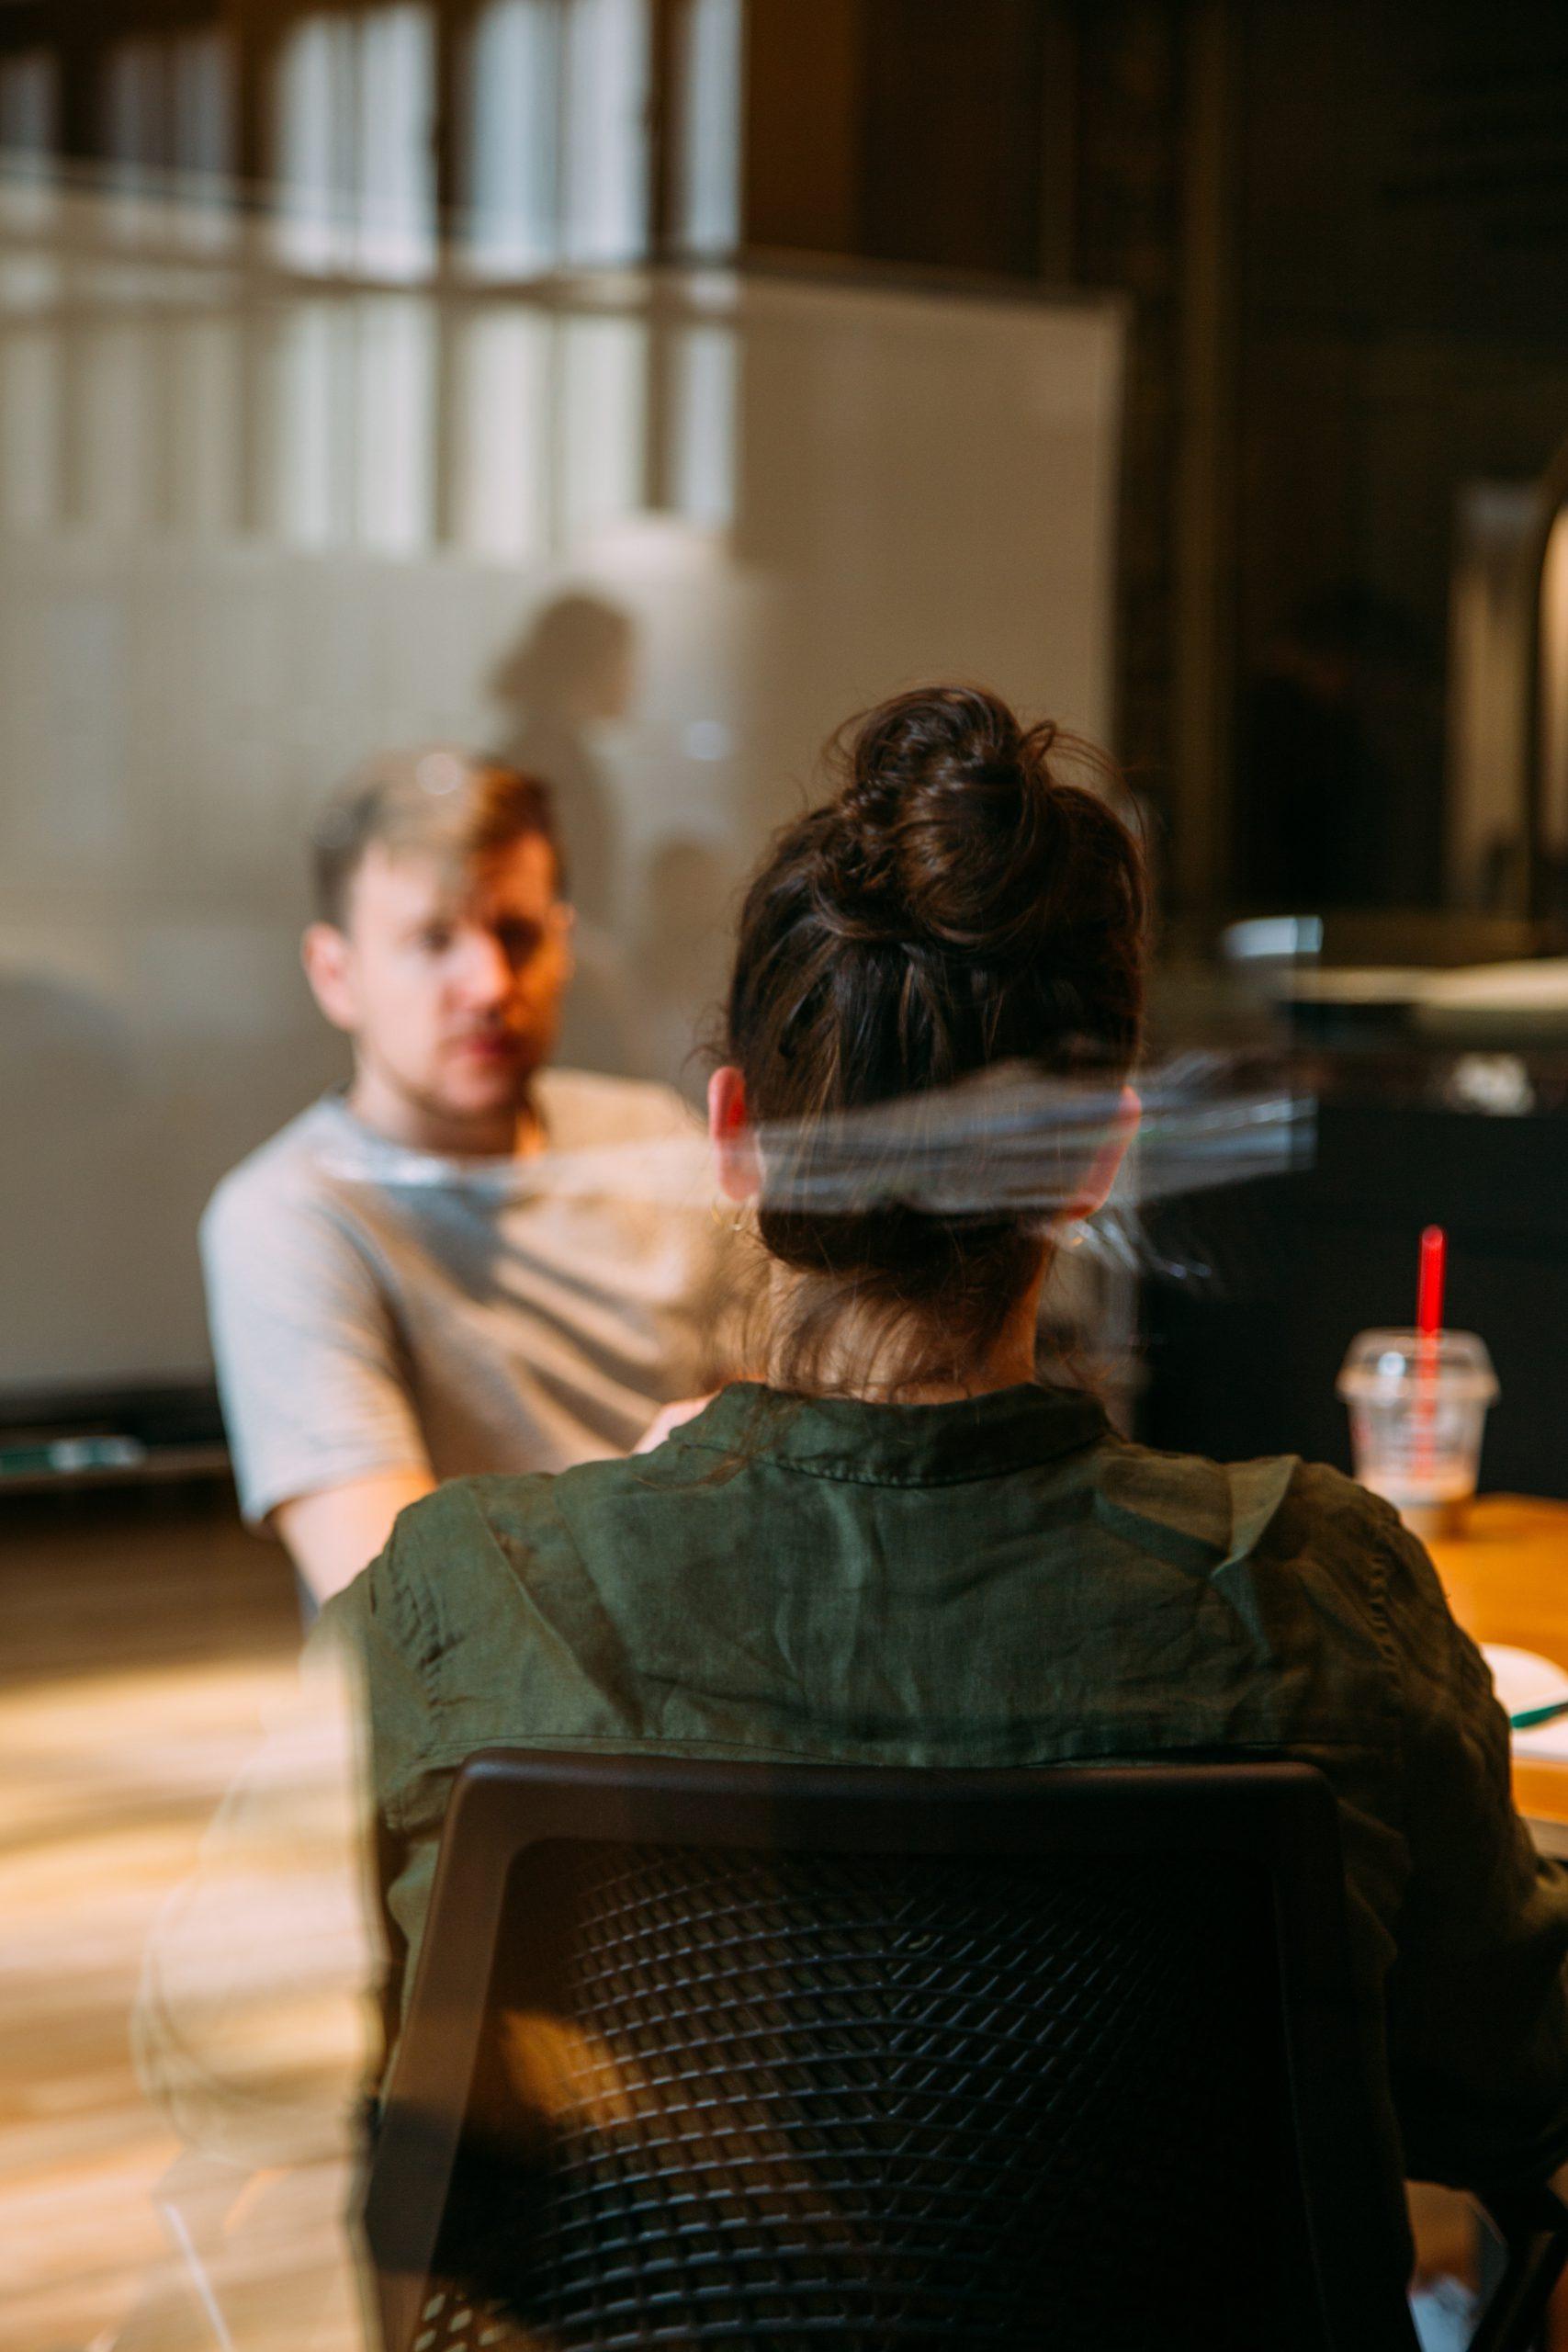 StressWise Academy is onderdeel van StressWise psychologen Nederland